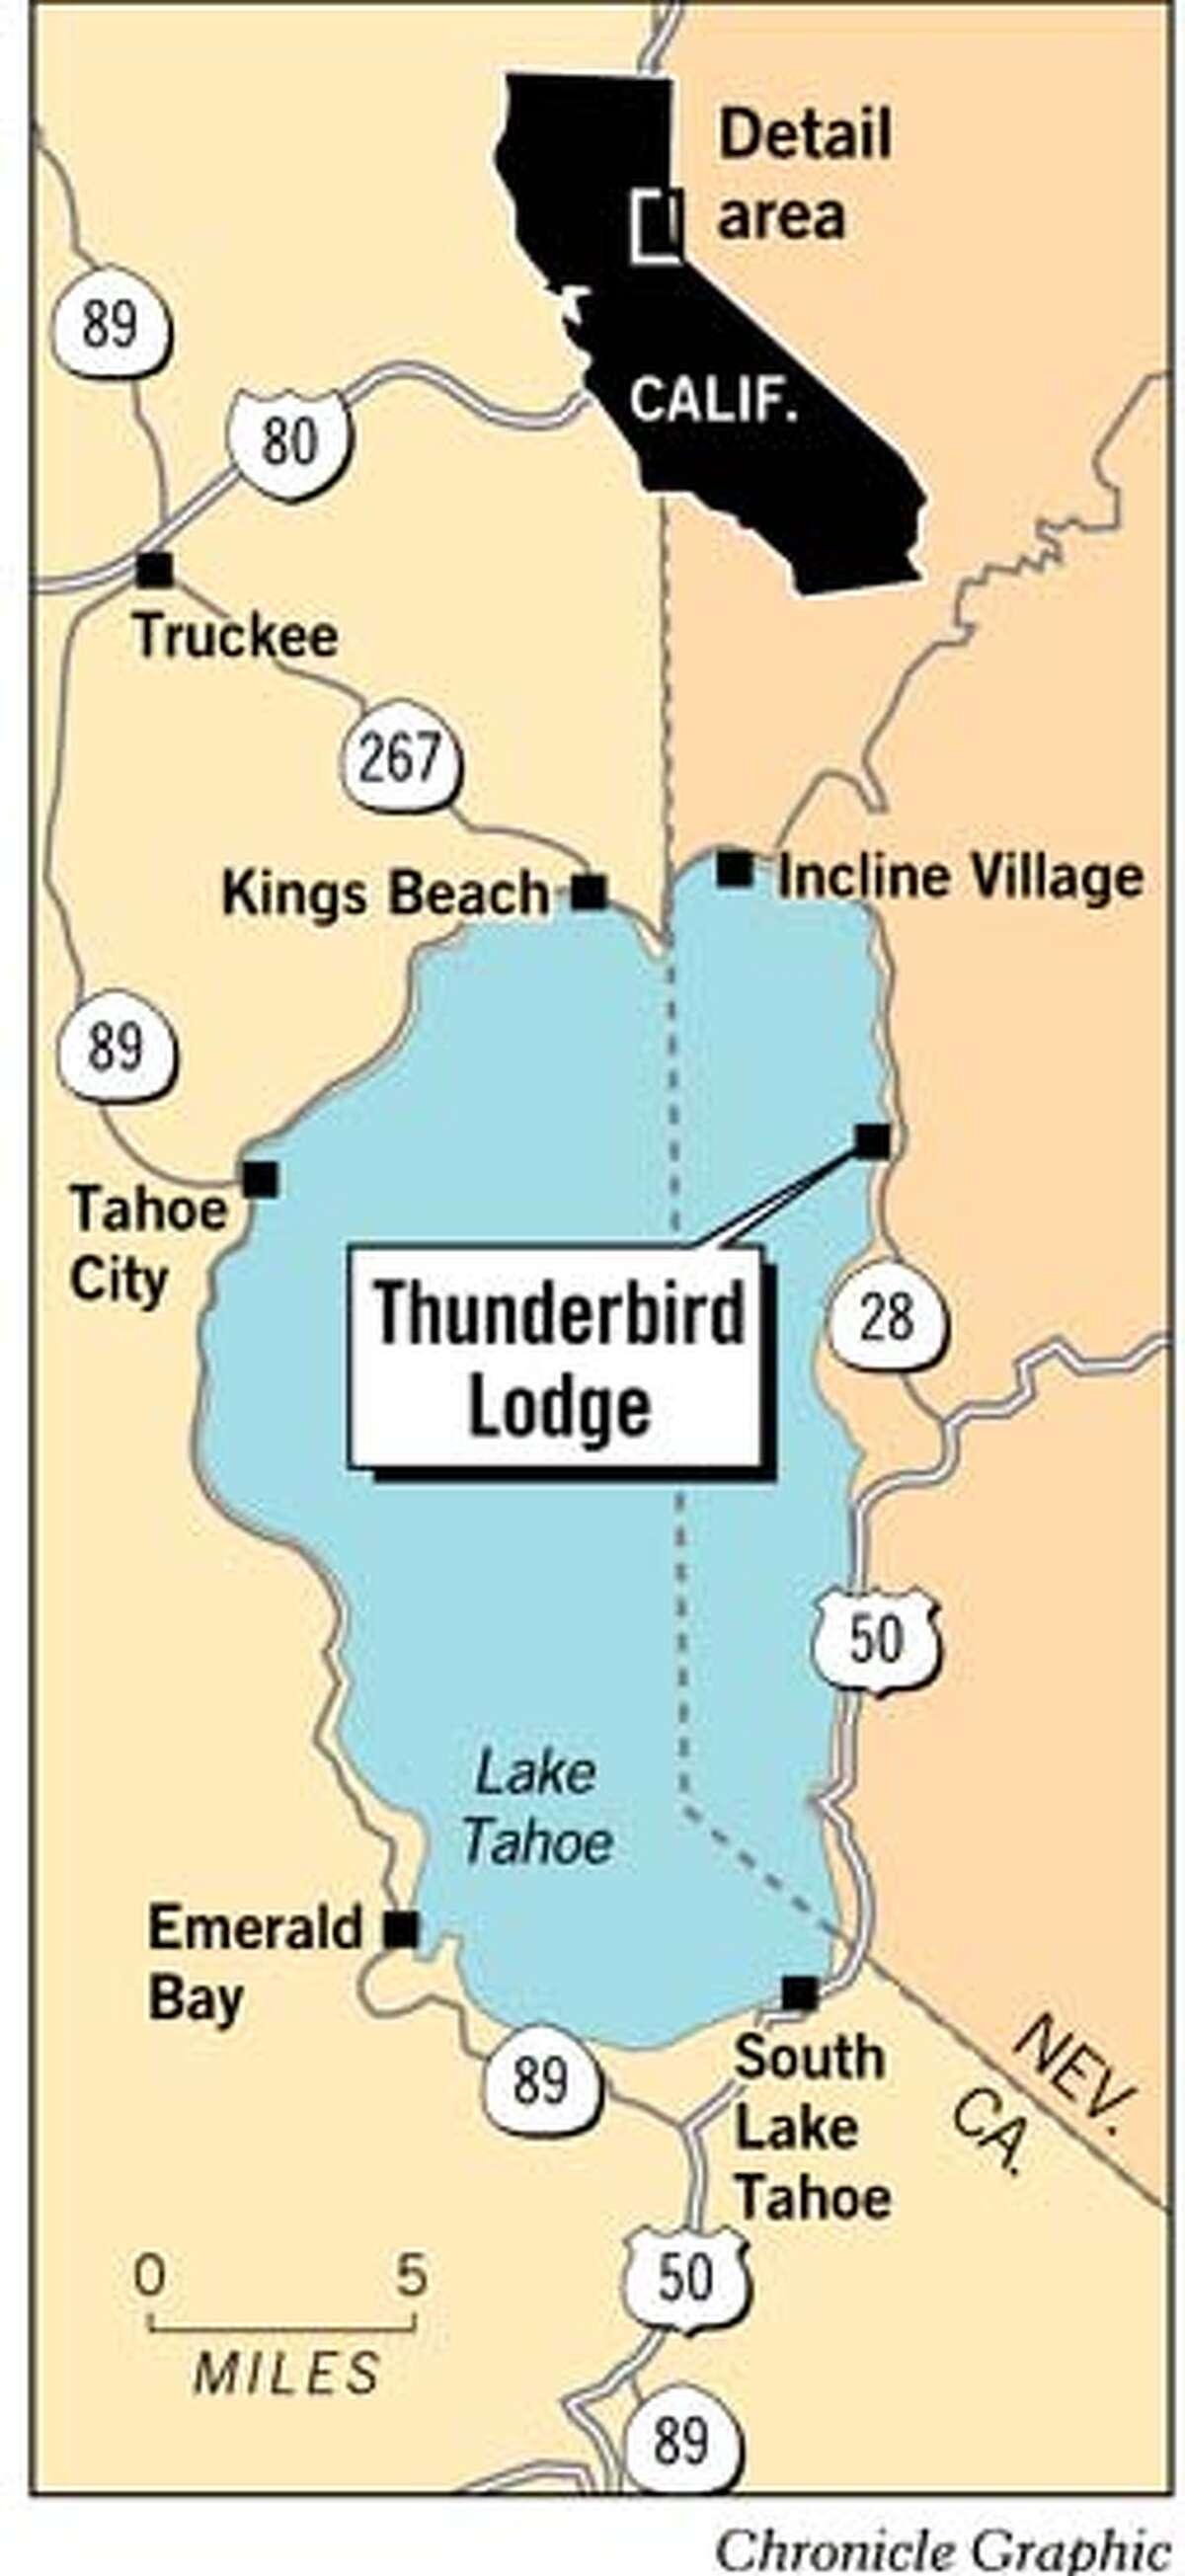 Thunderbird Lodge. Chronicle Graphic